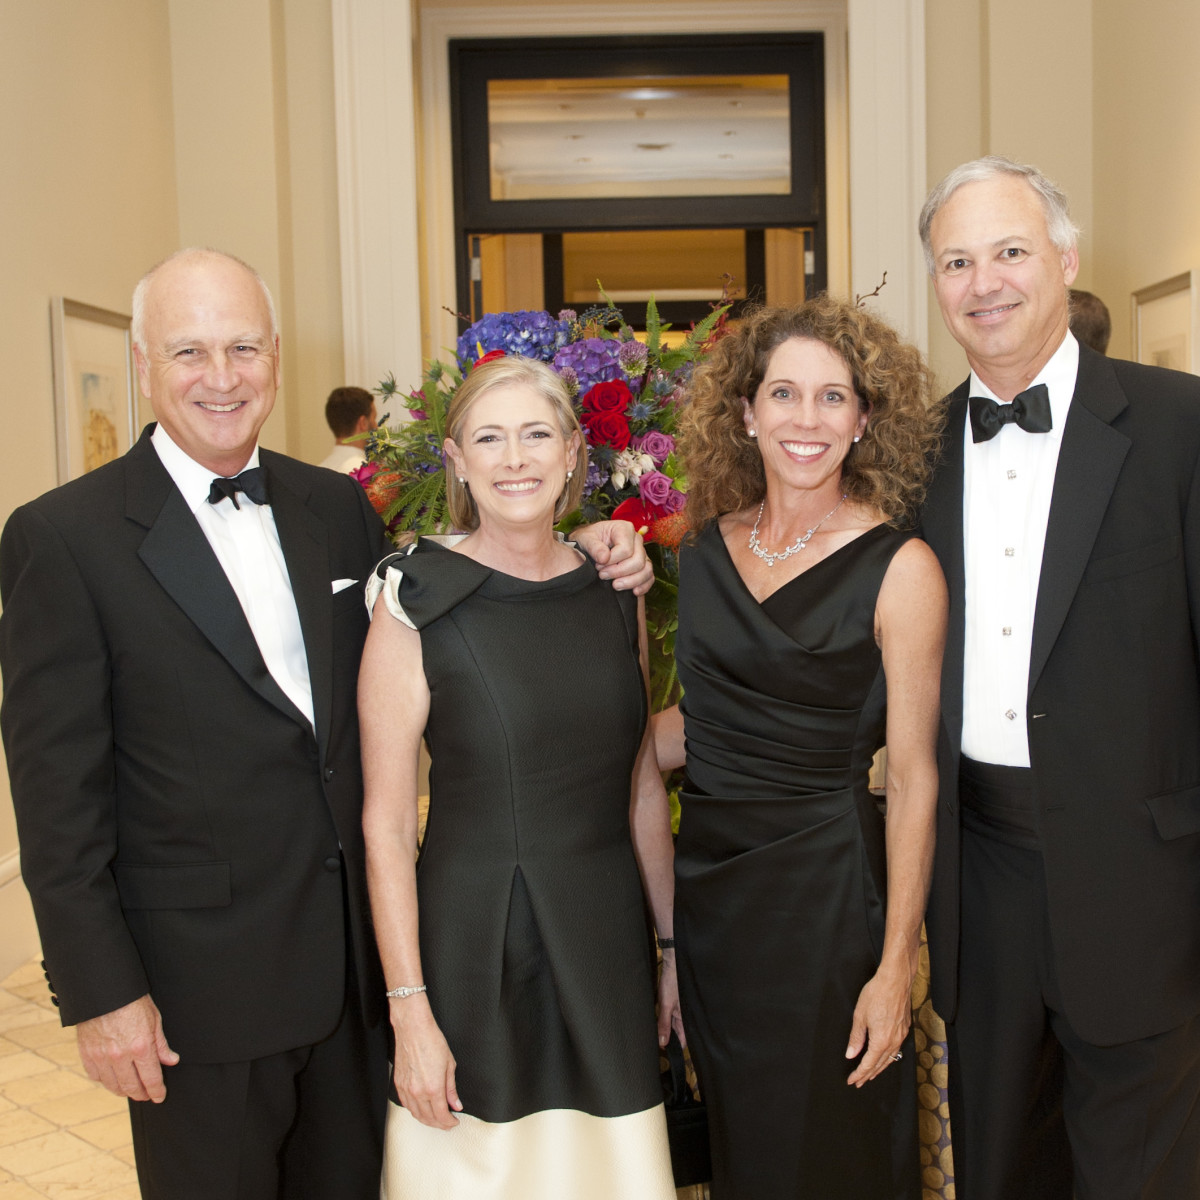 Jay Grogan, Whitney Grogan, Diane Byrd, Harold Byrd